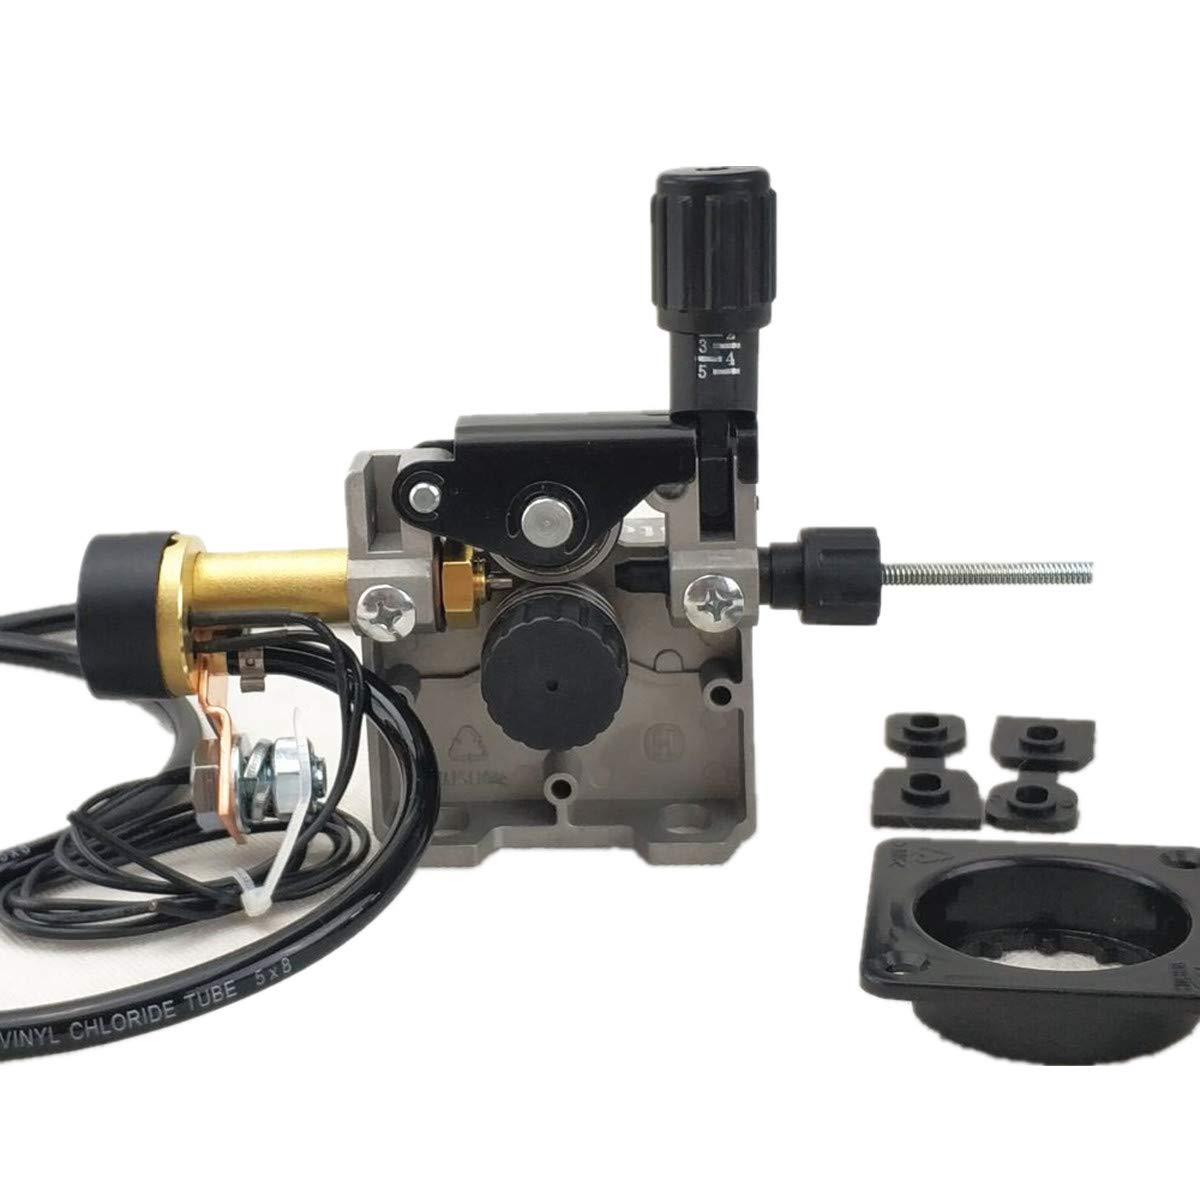 Wire Feeder, DC 24V/12V Welding Wire Feeding Assembly, for MIG/MAG Welder Welding Machine (DC 24V Version)